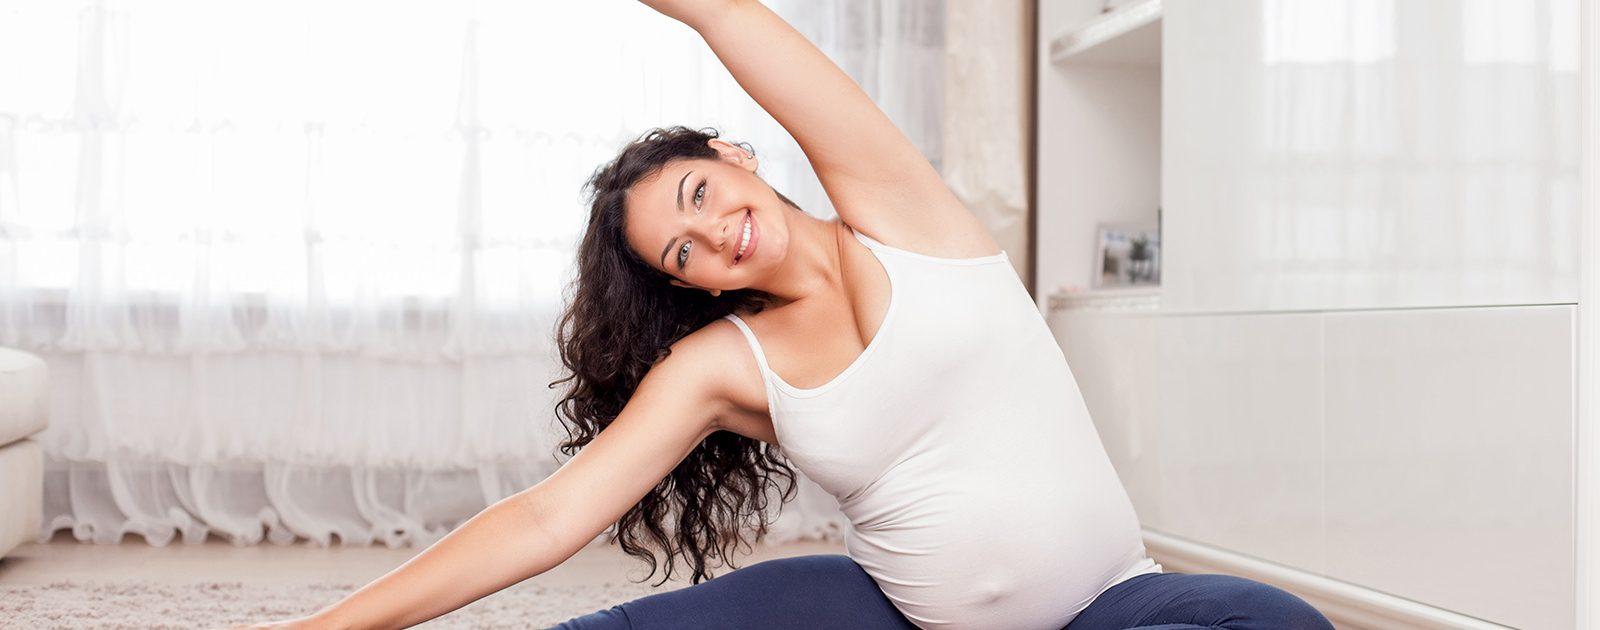 Frau macht Sport in der Schwangerschaft